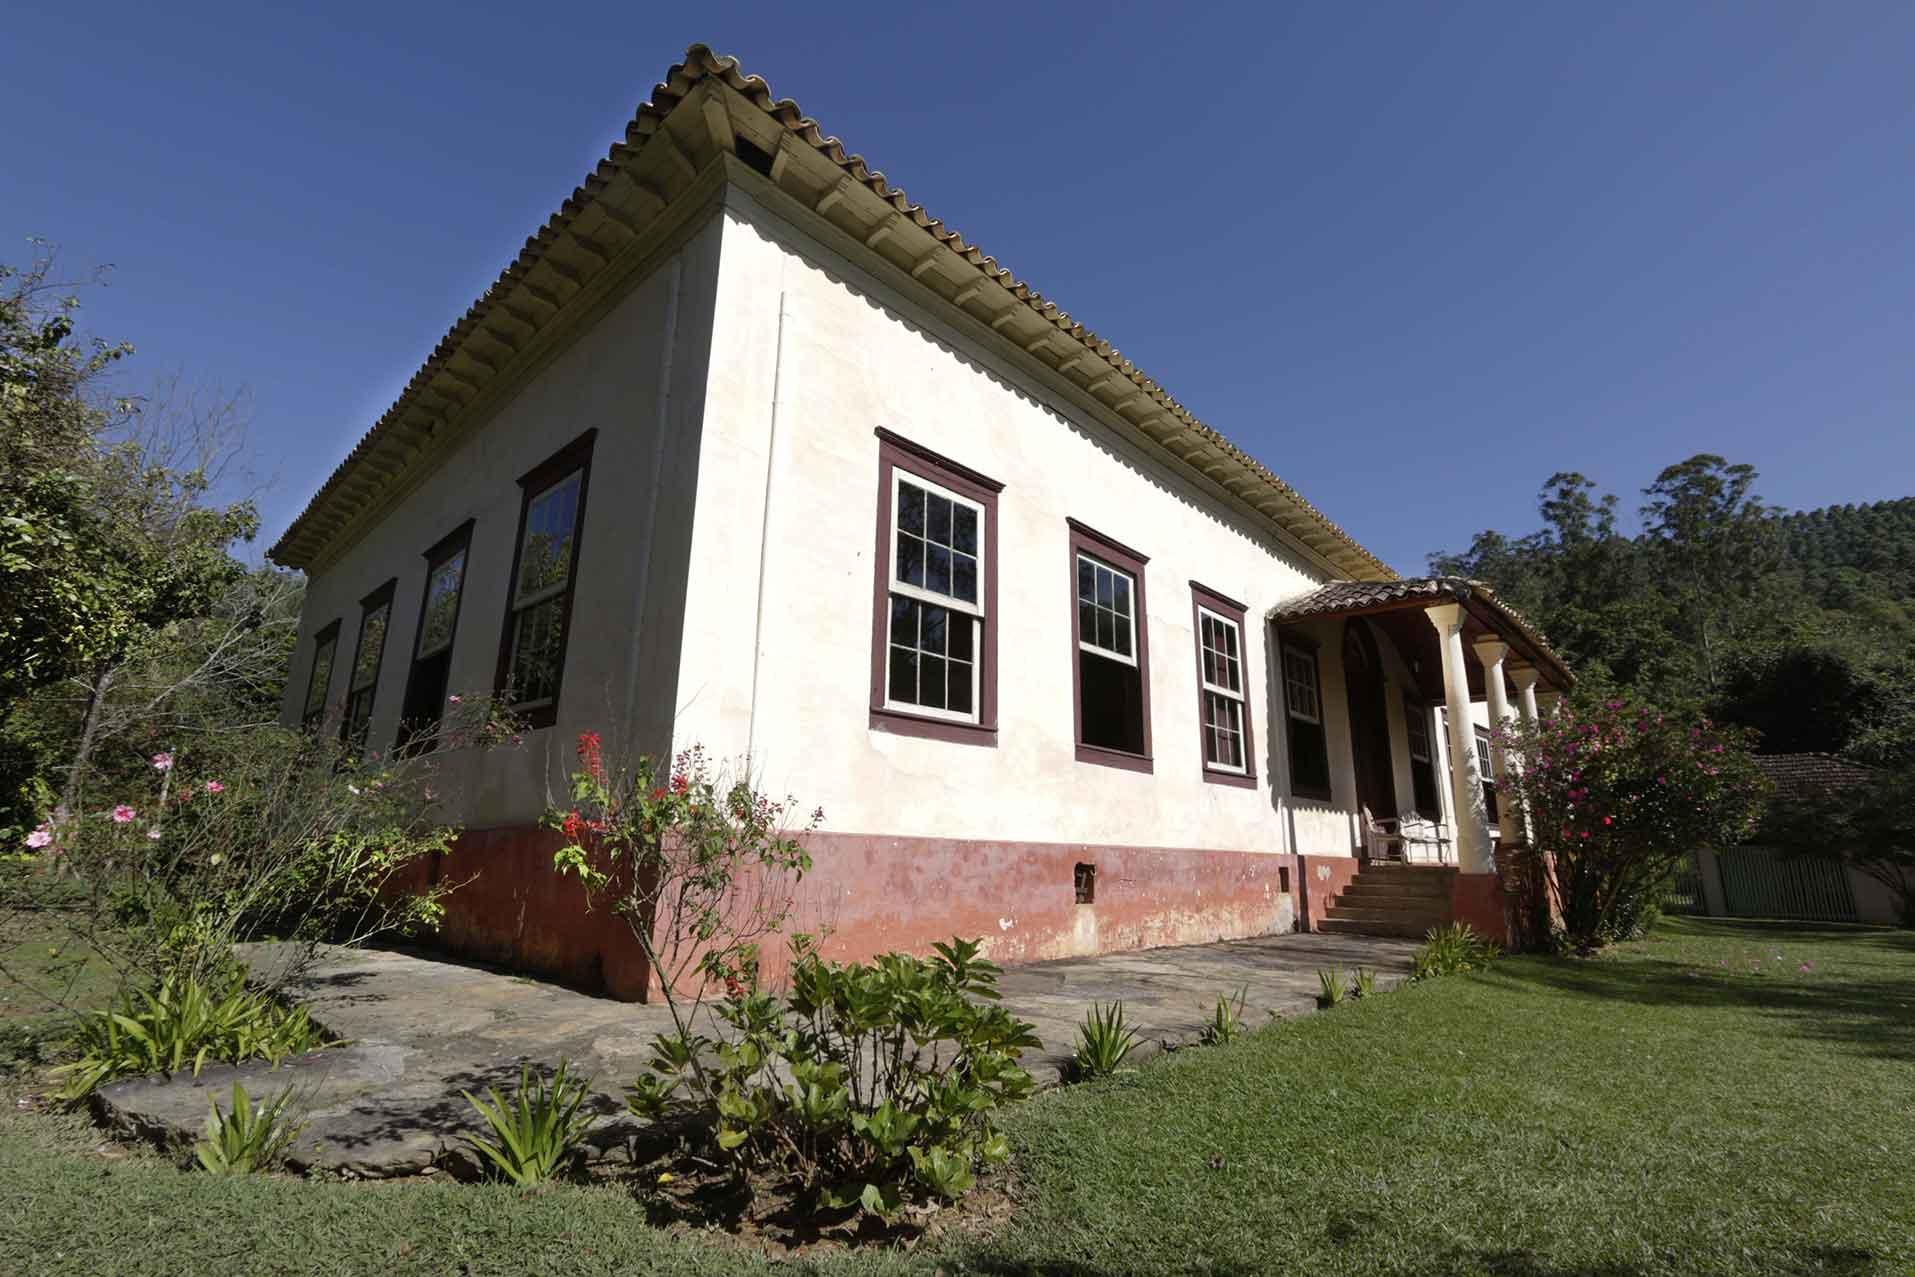 Monteiro-Lobato-Turismo-Rural-sitio-buquira-Fazenda buquira_MG_7398-bx